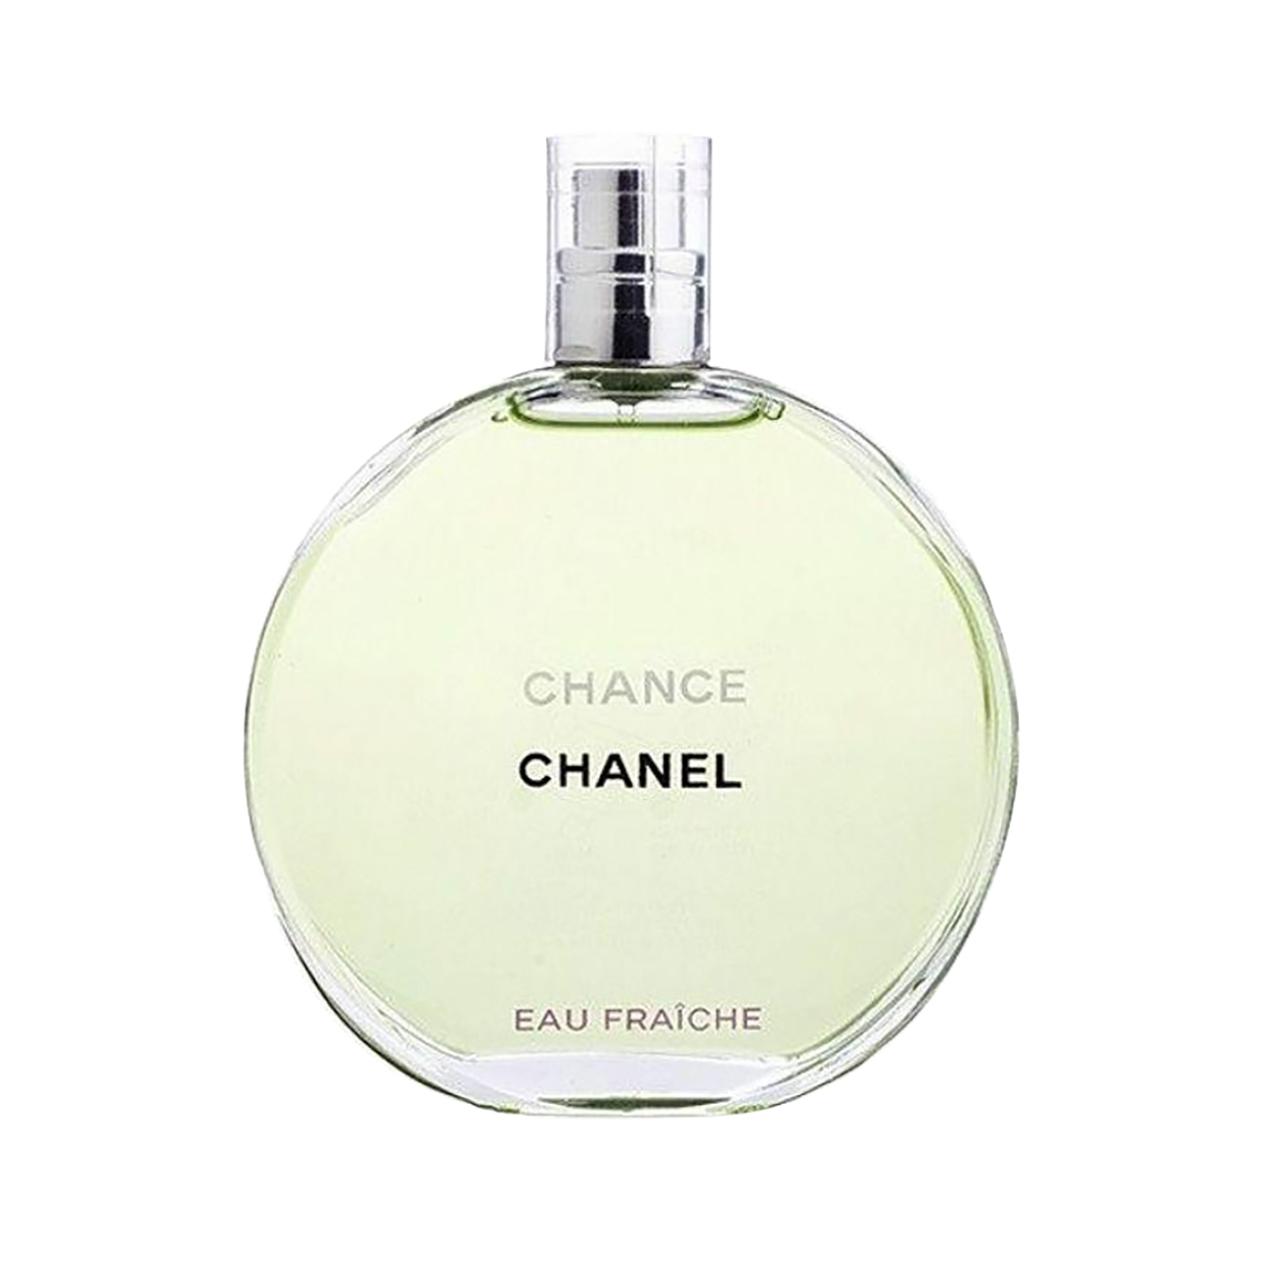 تستر ادو تویلت زنانه شانل مدل Chance Eau Fraiche حجم 100 میلیلیتر